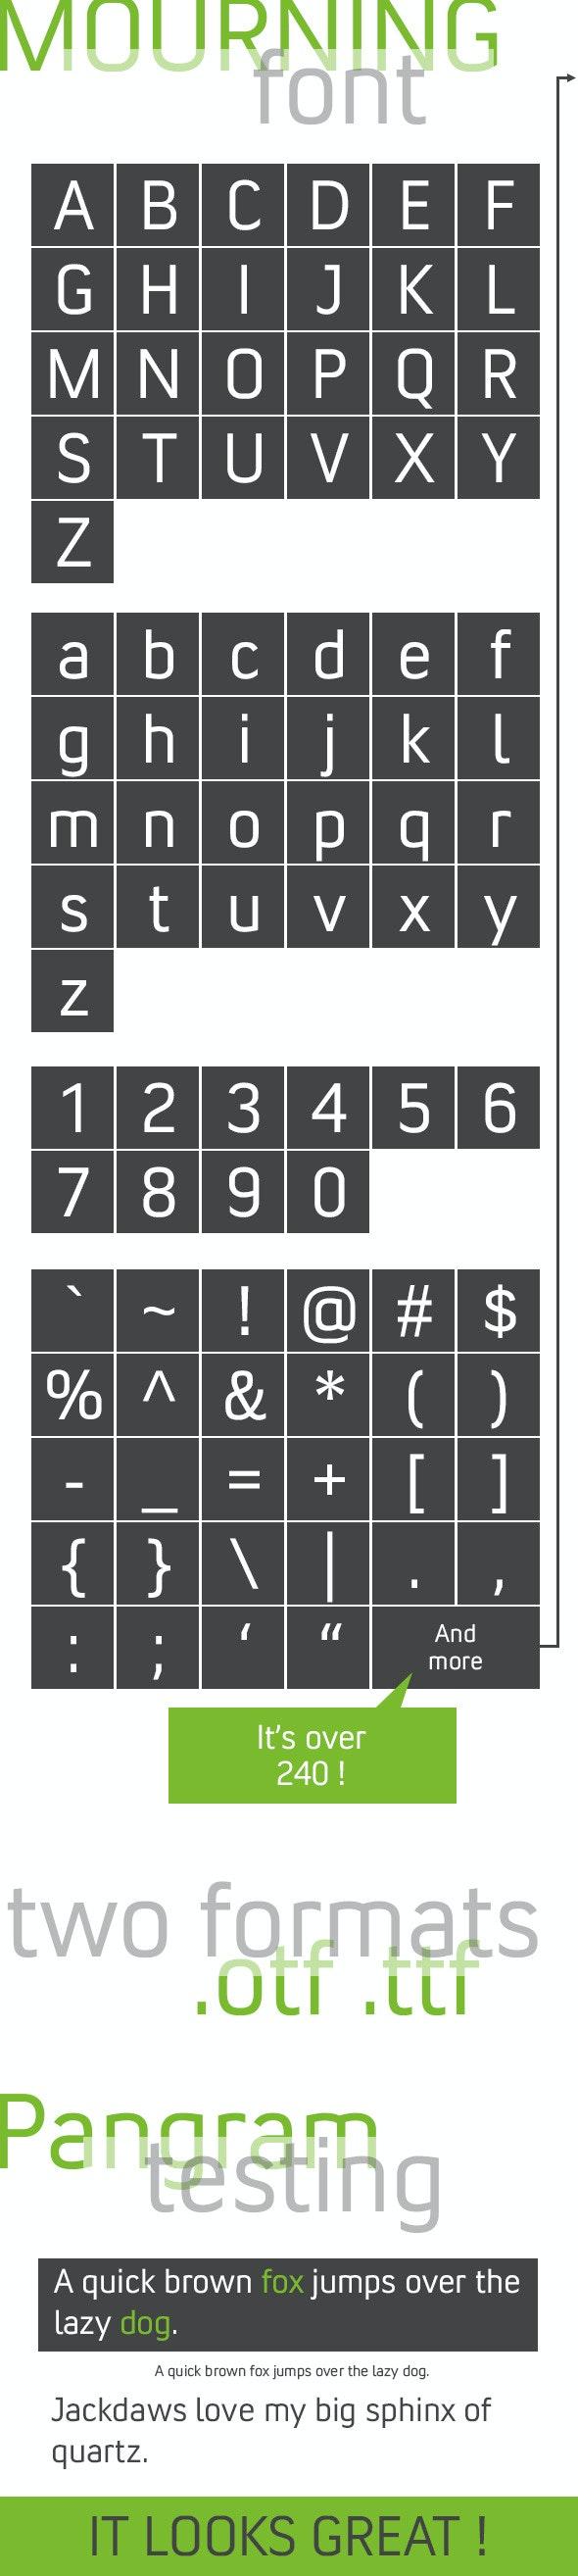 Mourning - Sans-Serif Fonts